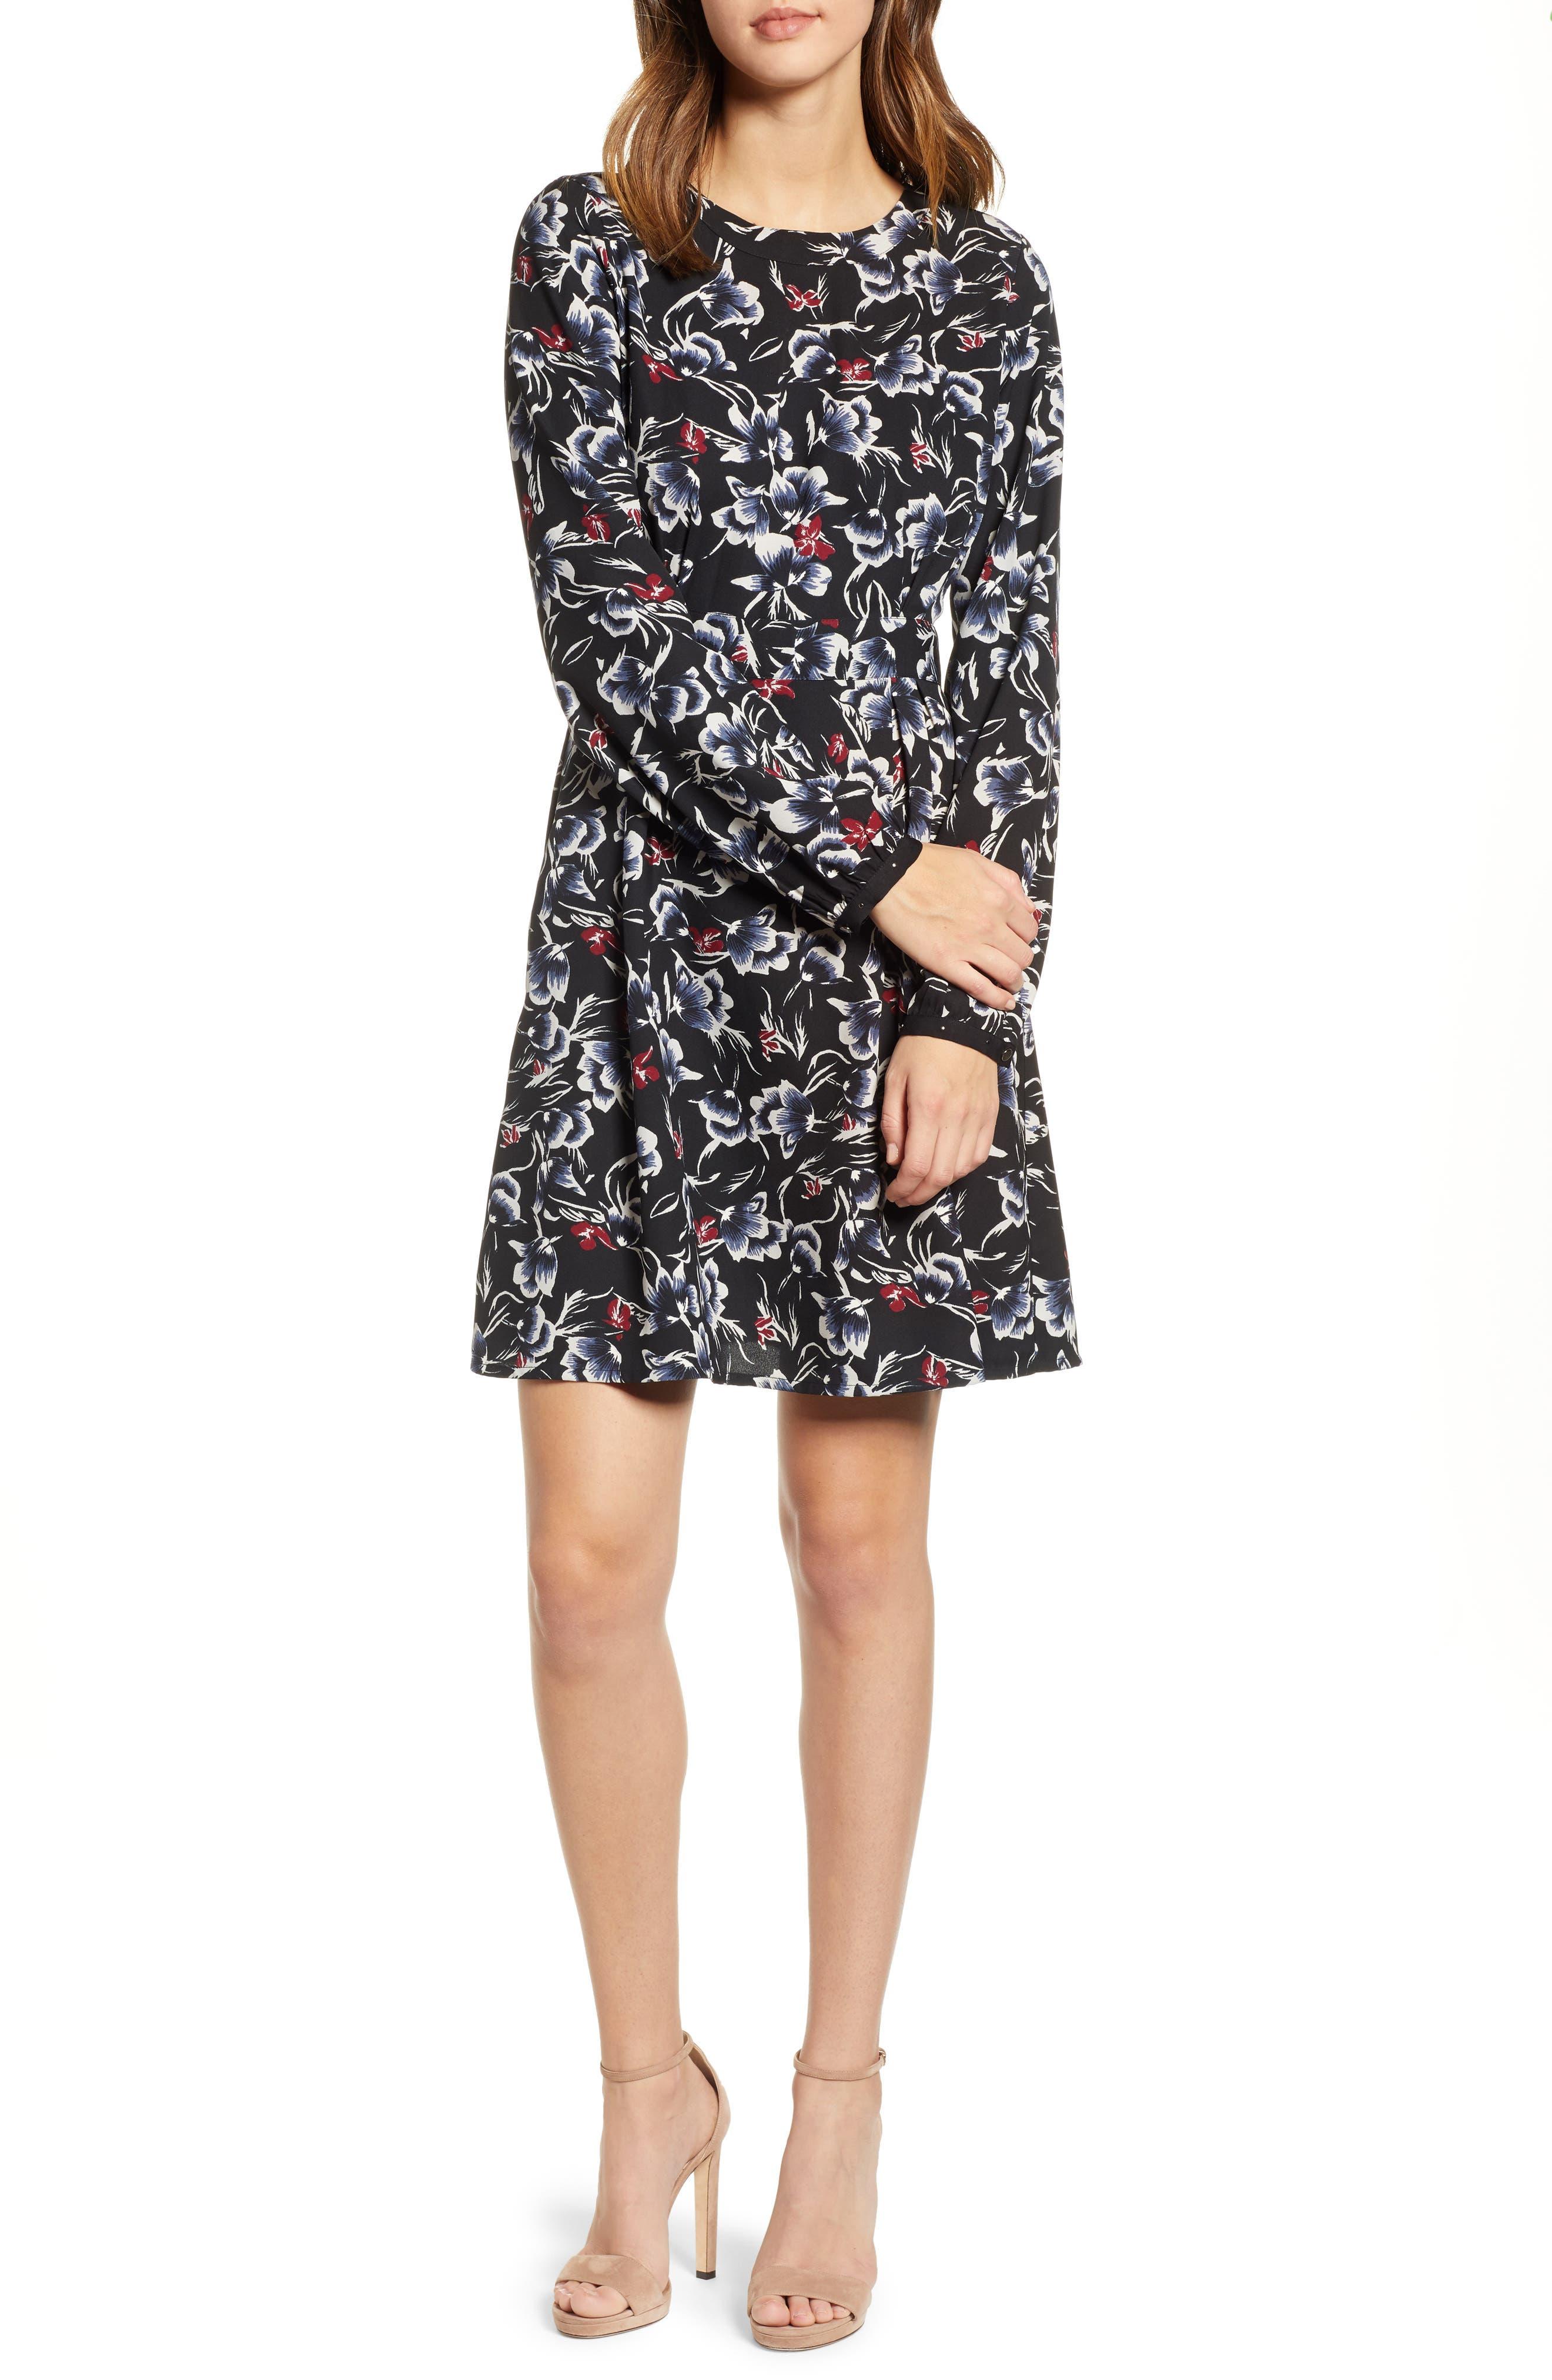 Vero Moda Floral Print Dress, Black